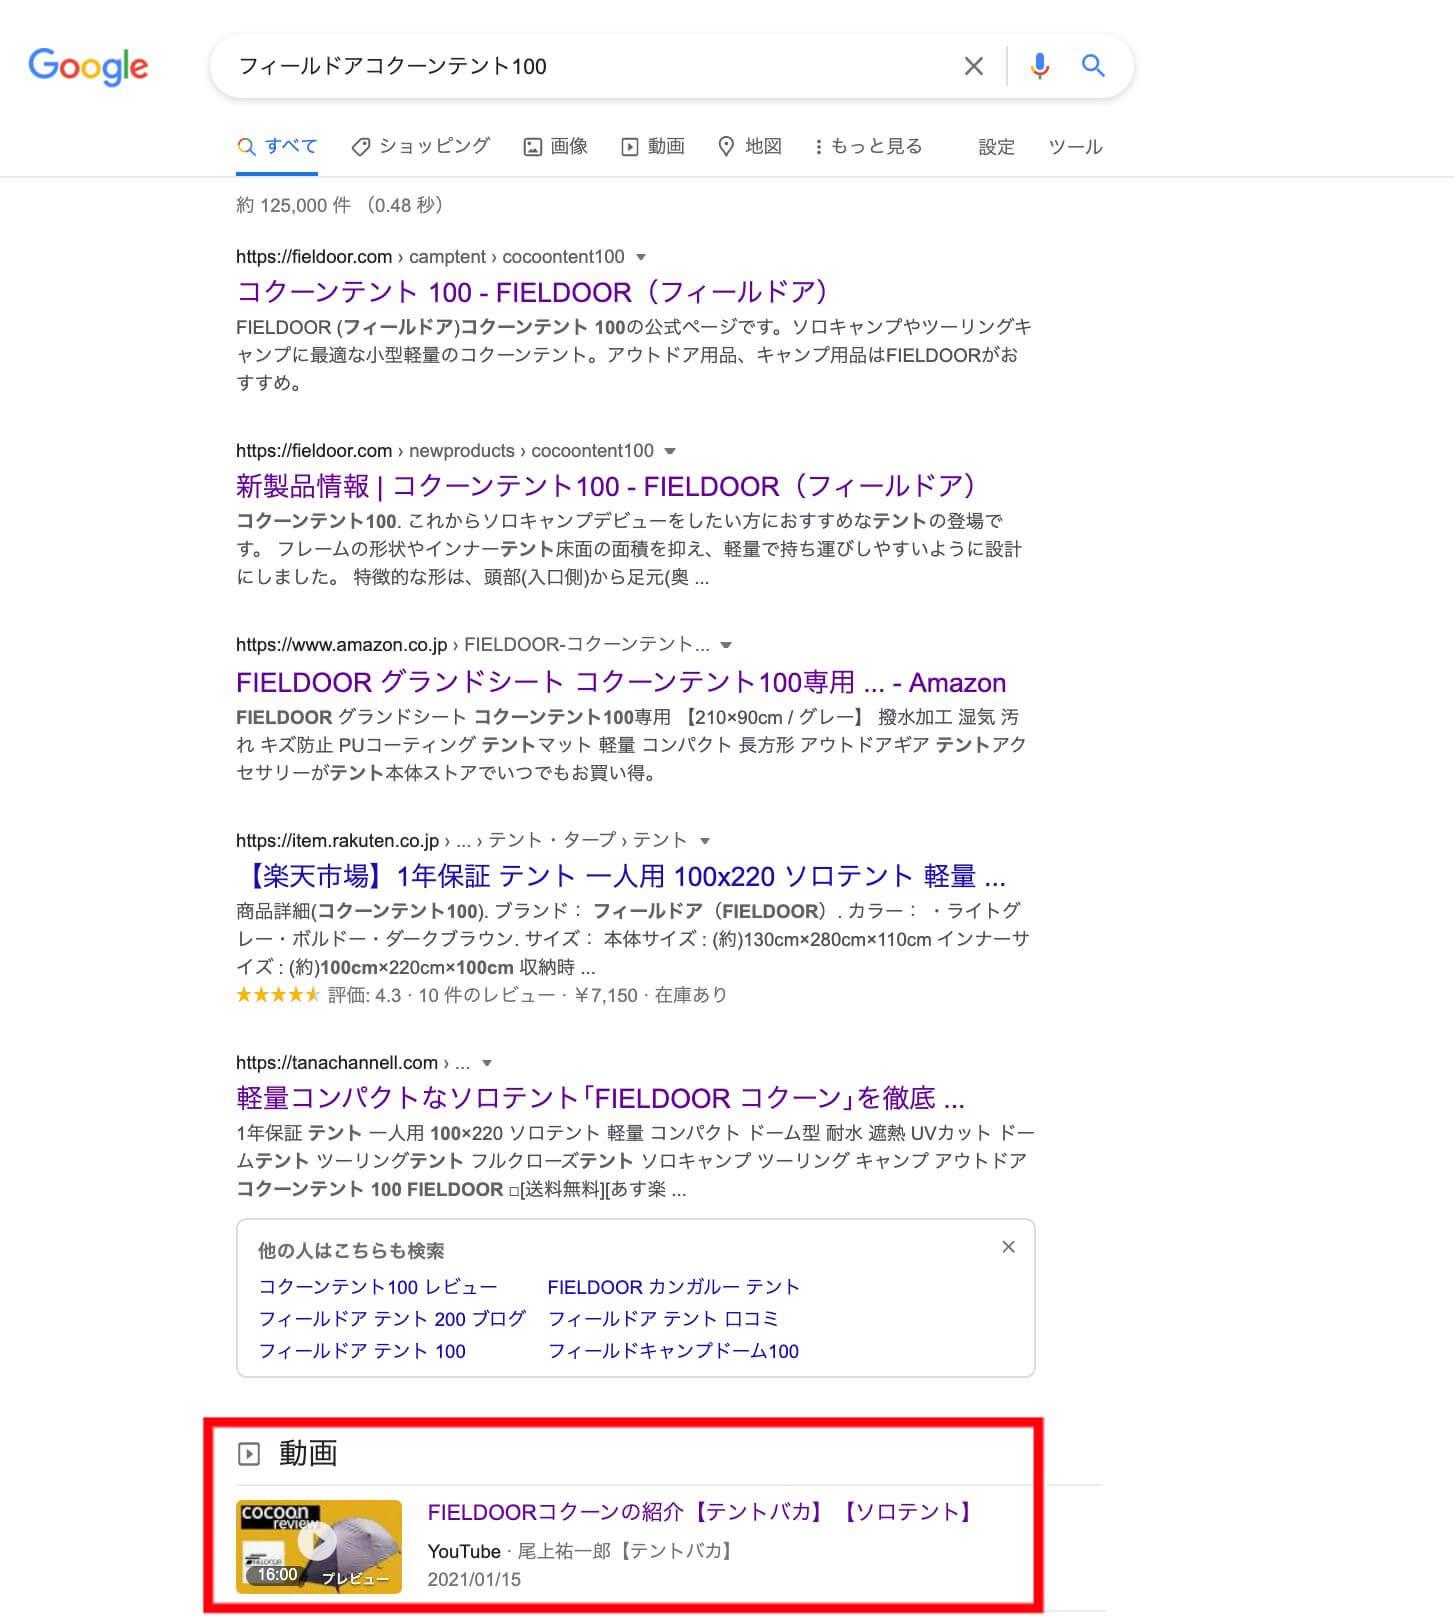 youtube_camp_FIELDOOR google search